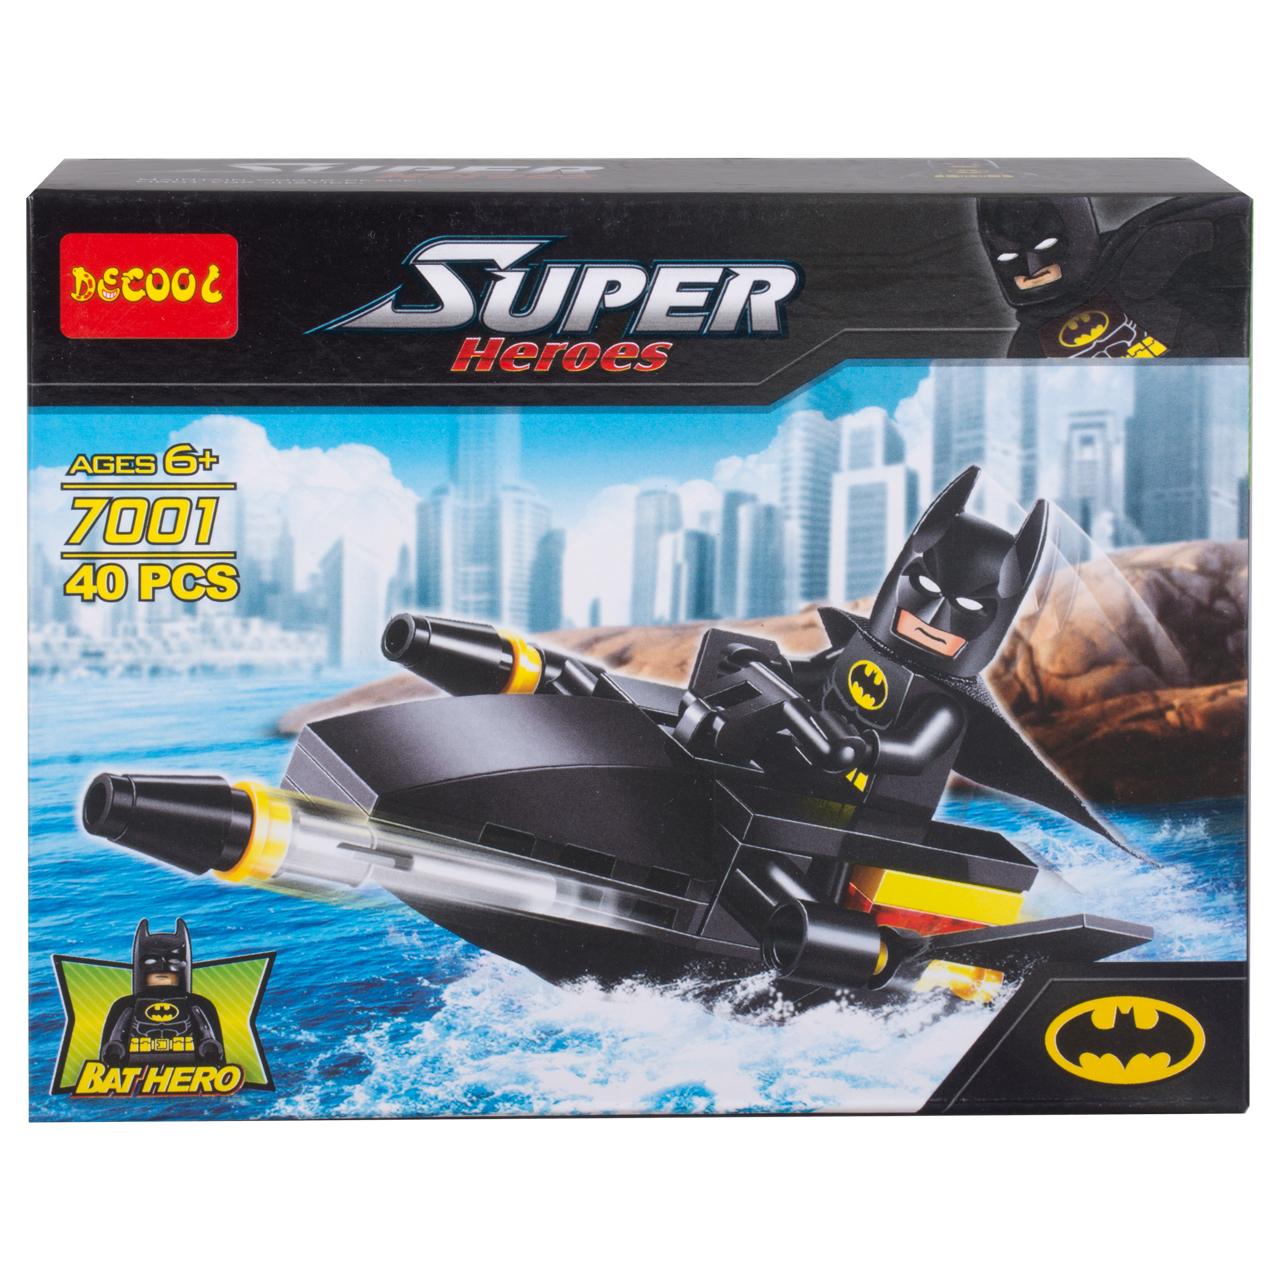 ساختنی دکول مدل Bat Hero